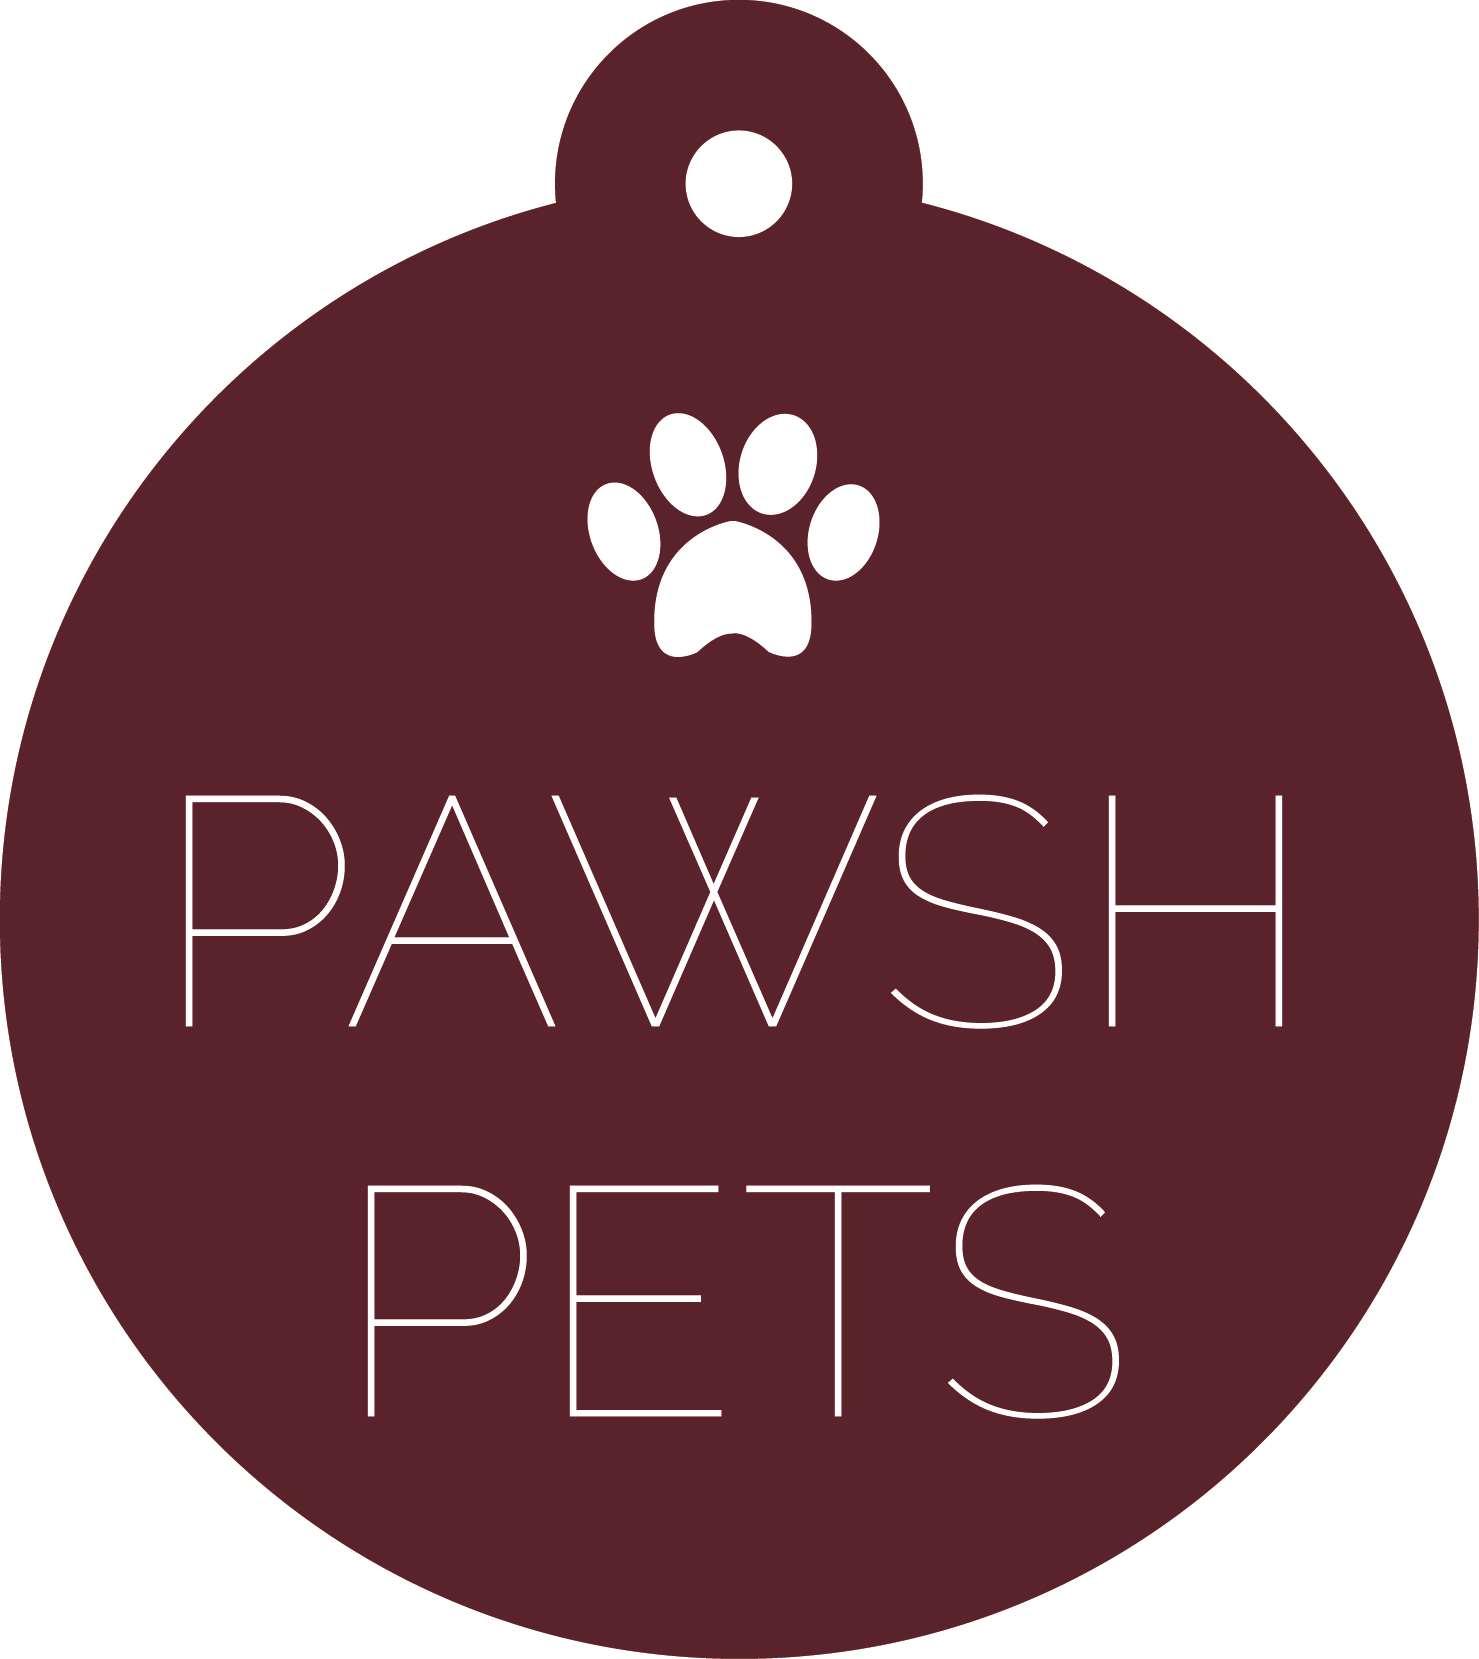 Pawsh Pets